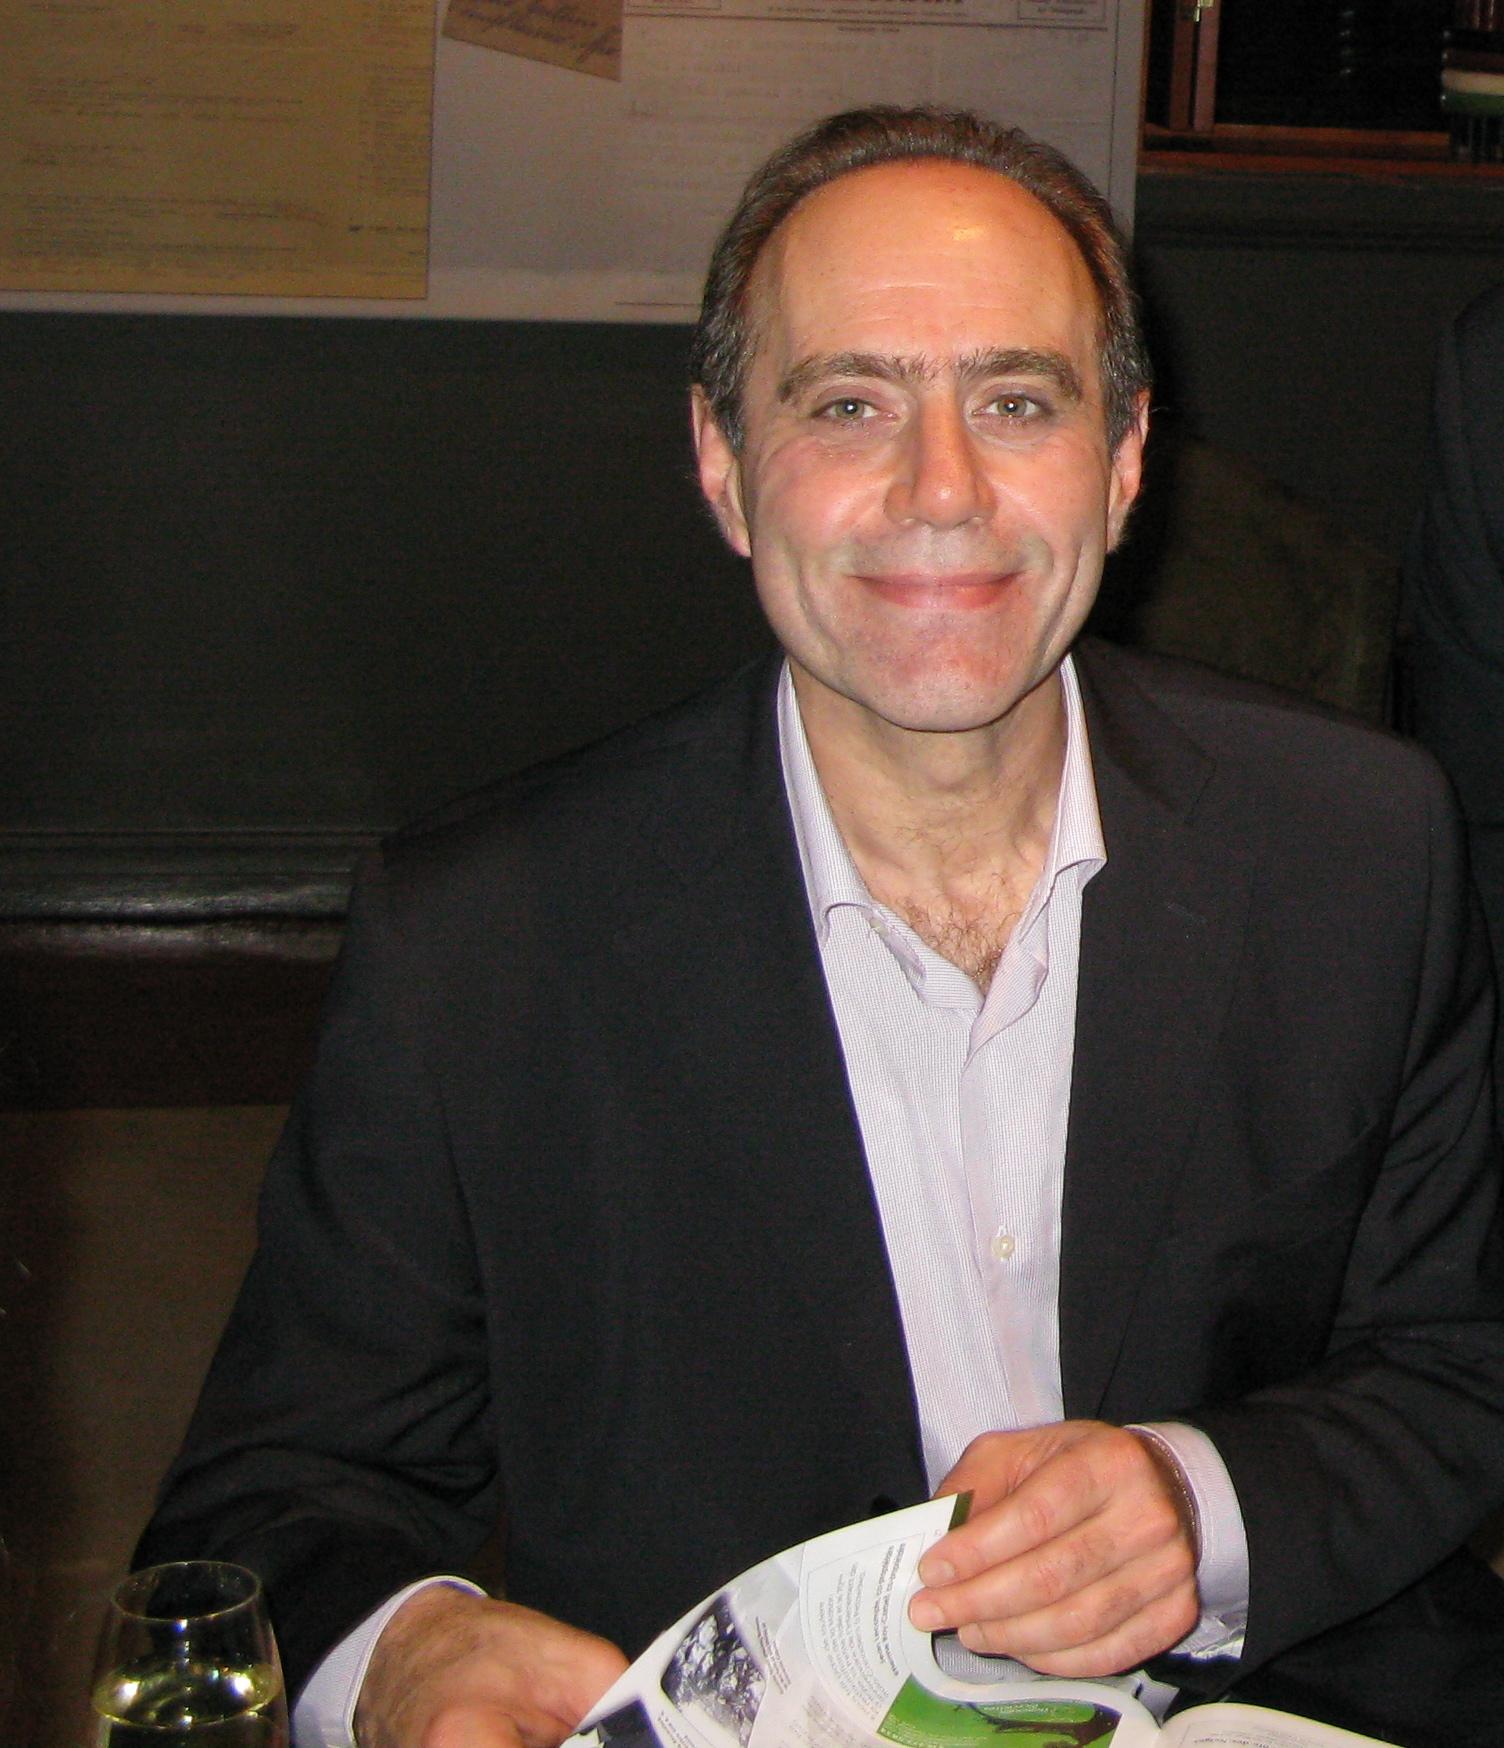 Mr. Rossi, October 2010